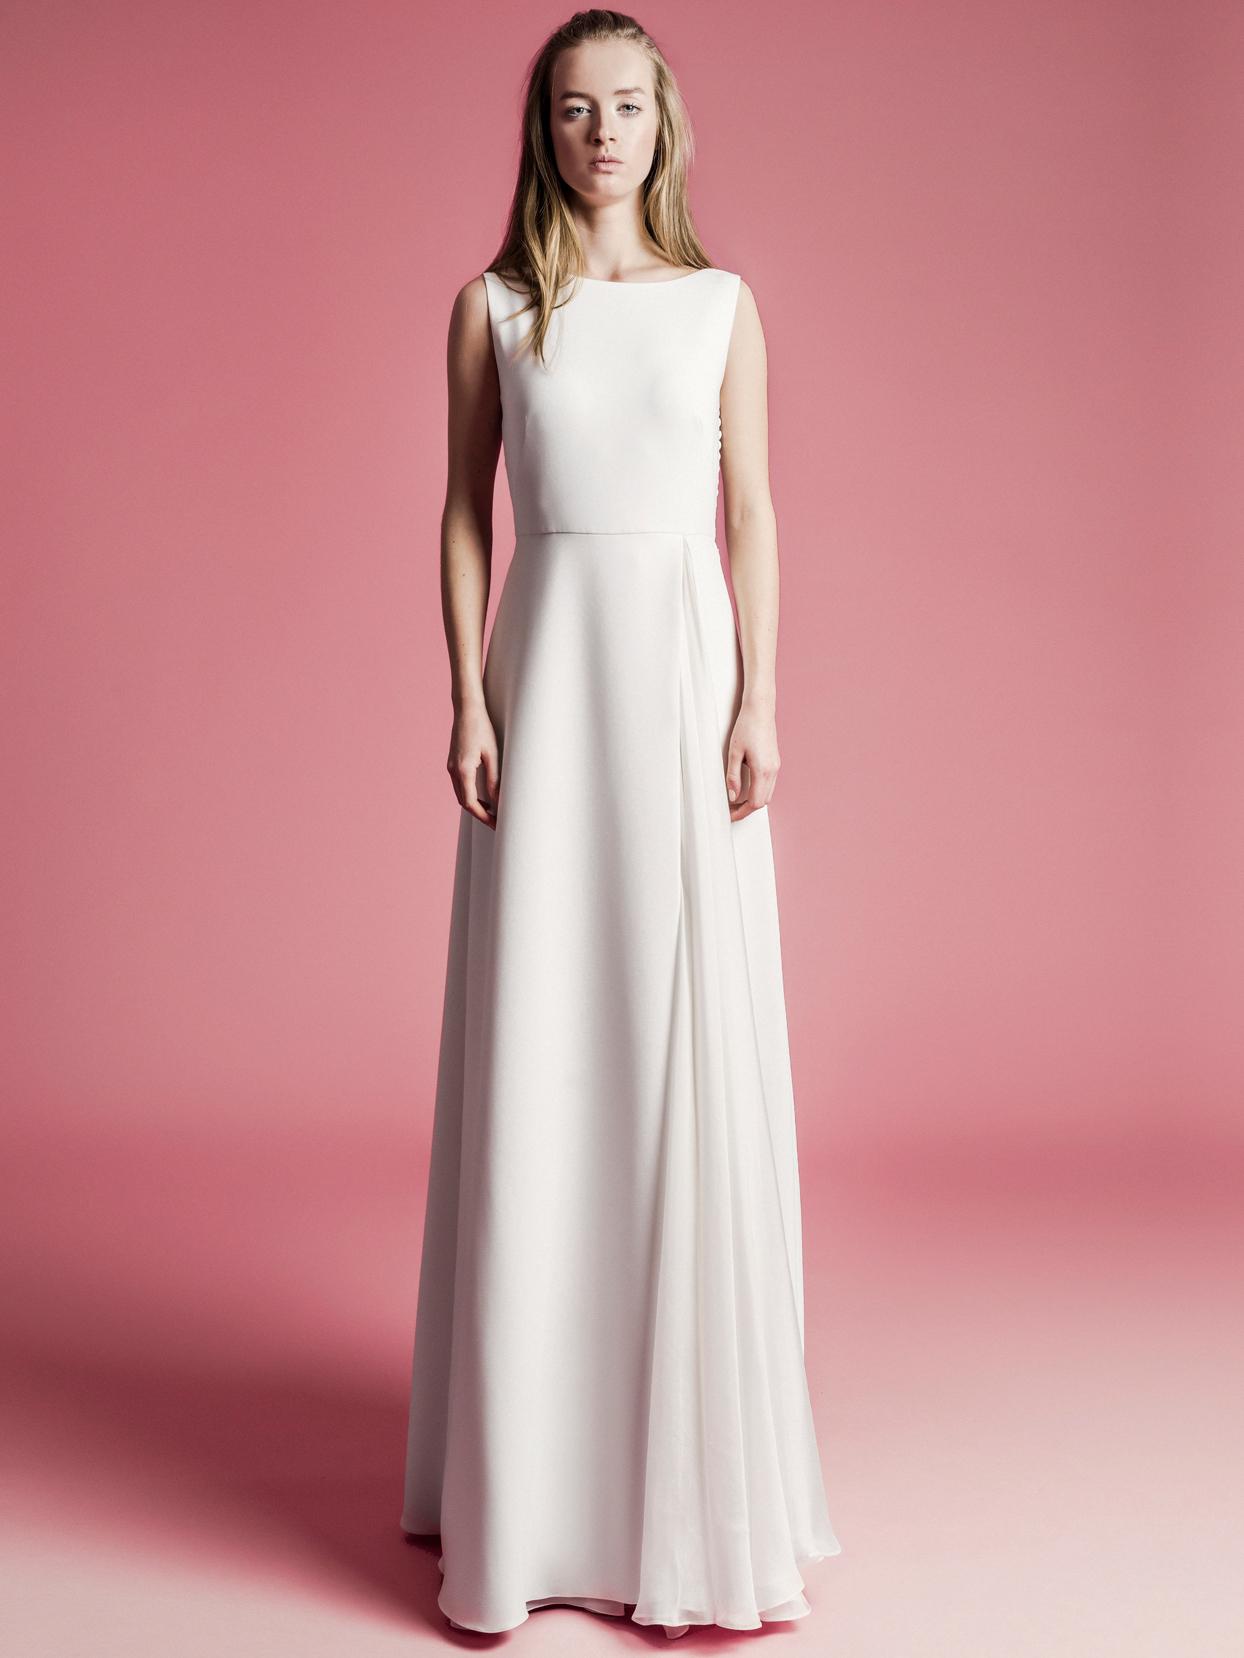 Sophie Et Voilà high neck sleeveless a-line wedding dress spring 2021